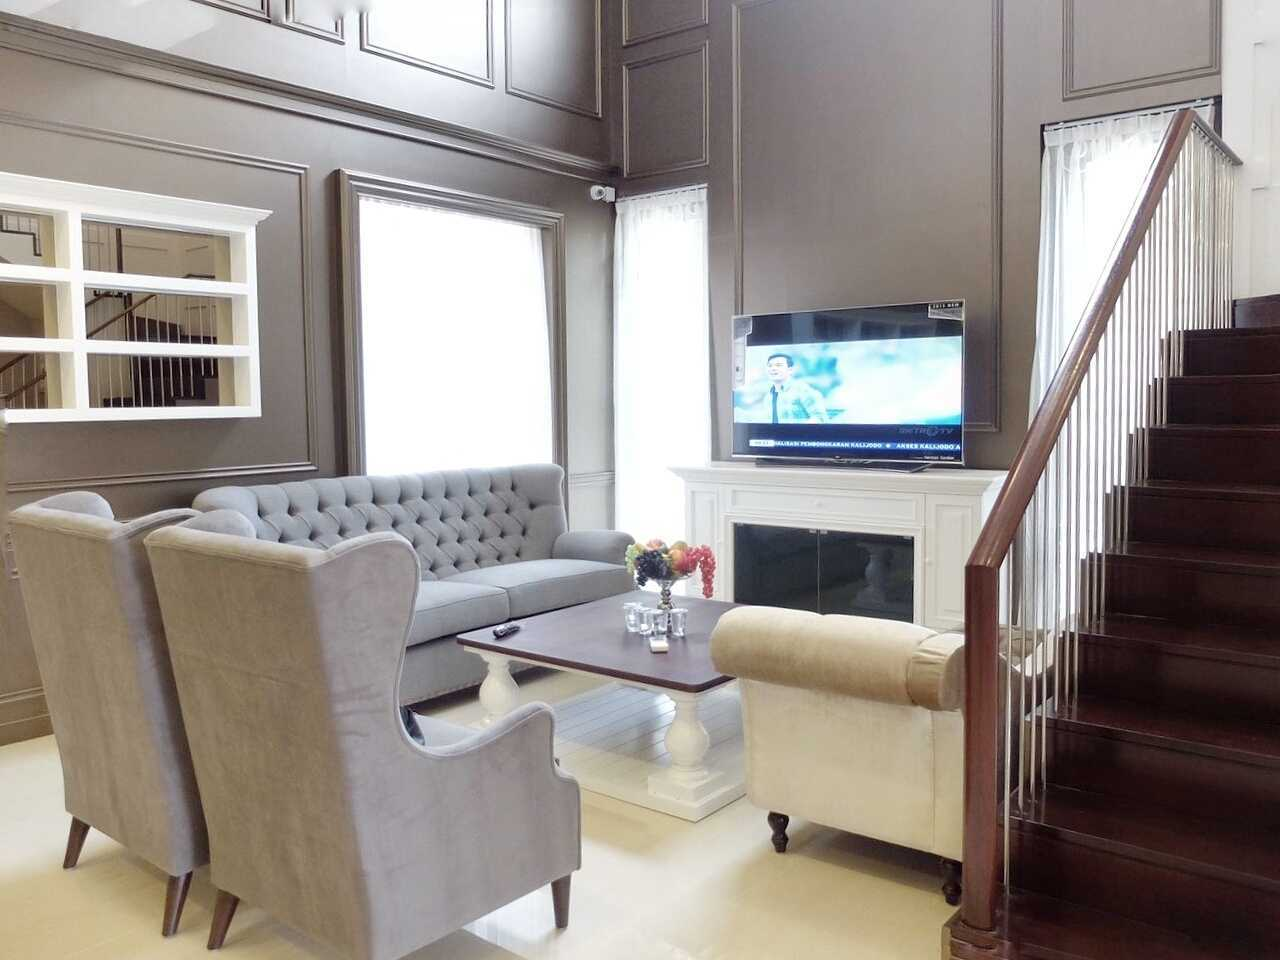 7Design Architect Mrs. D House Citrasun, Yogjakarta Citrasun, Yogjakarta Livingroom Klasik 18697